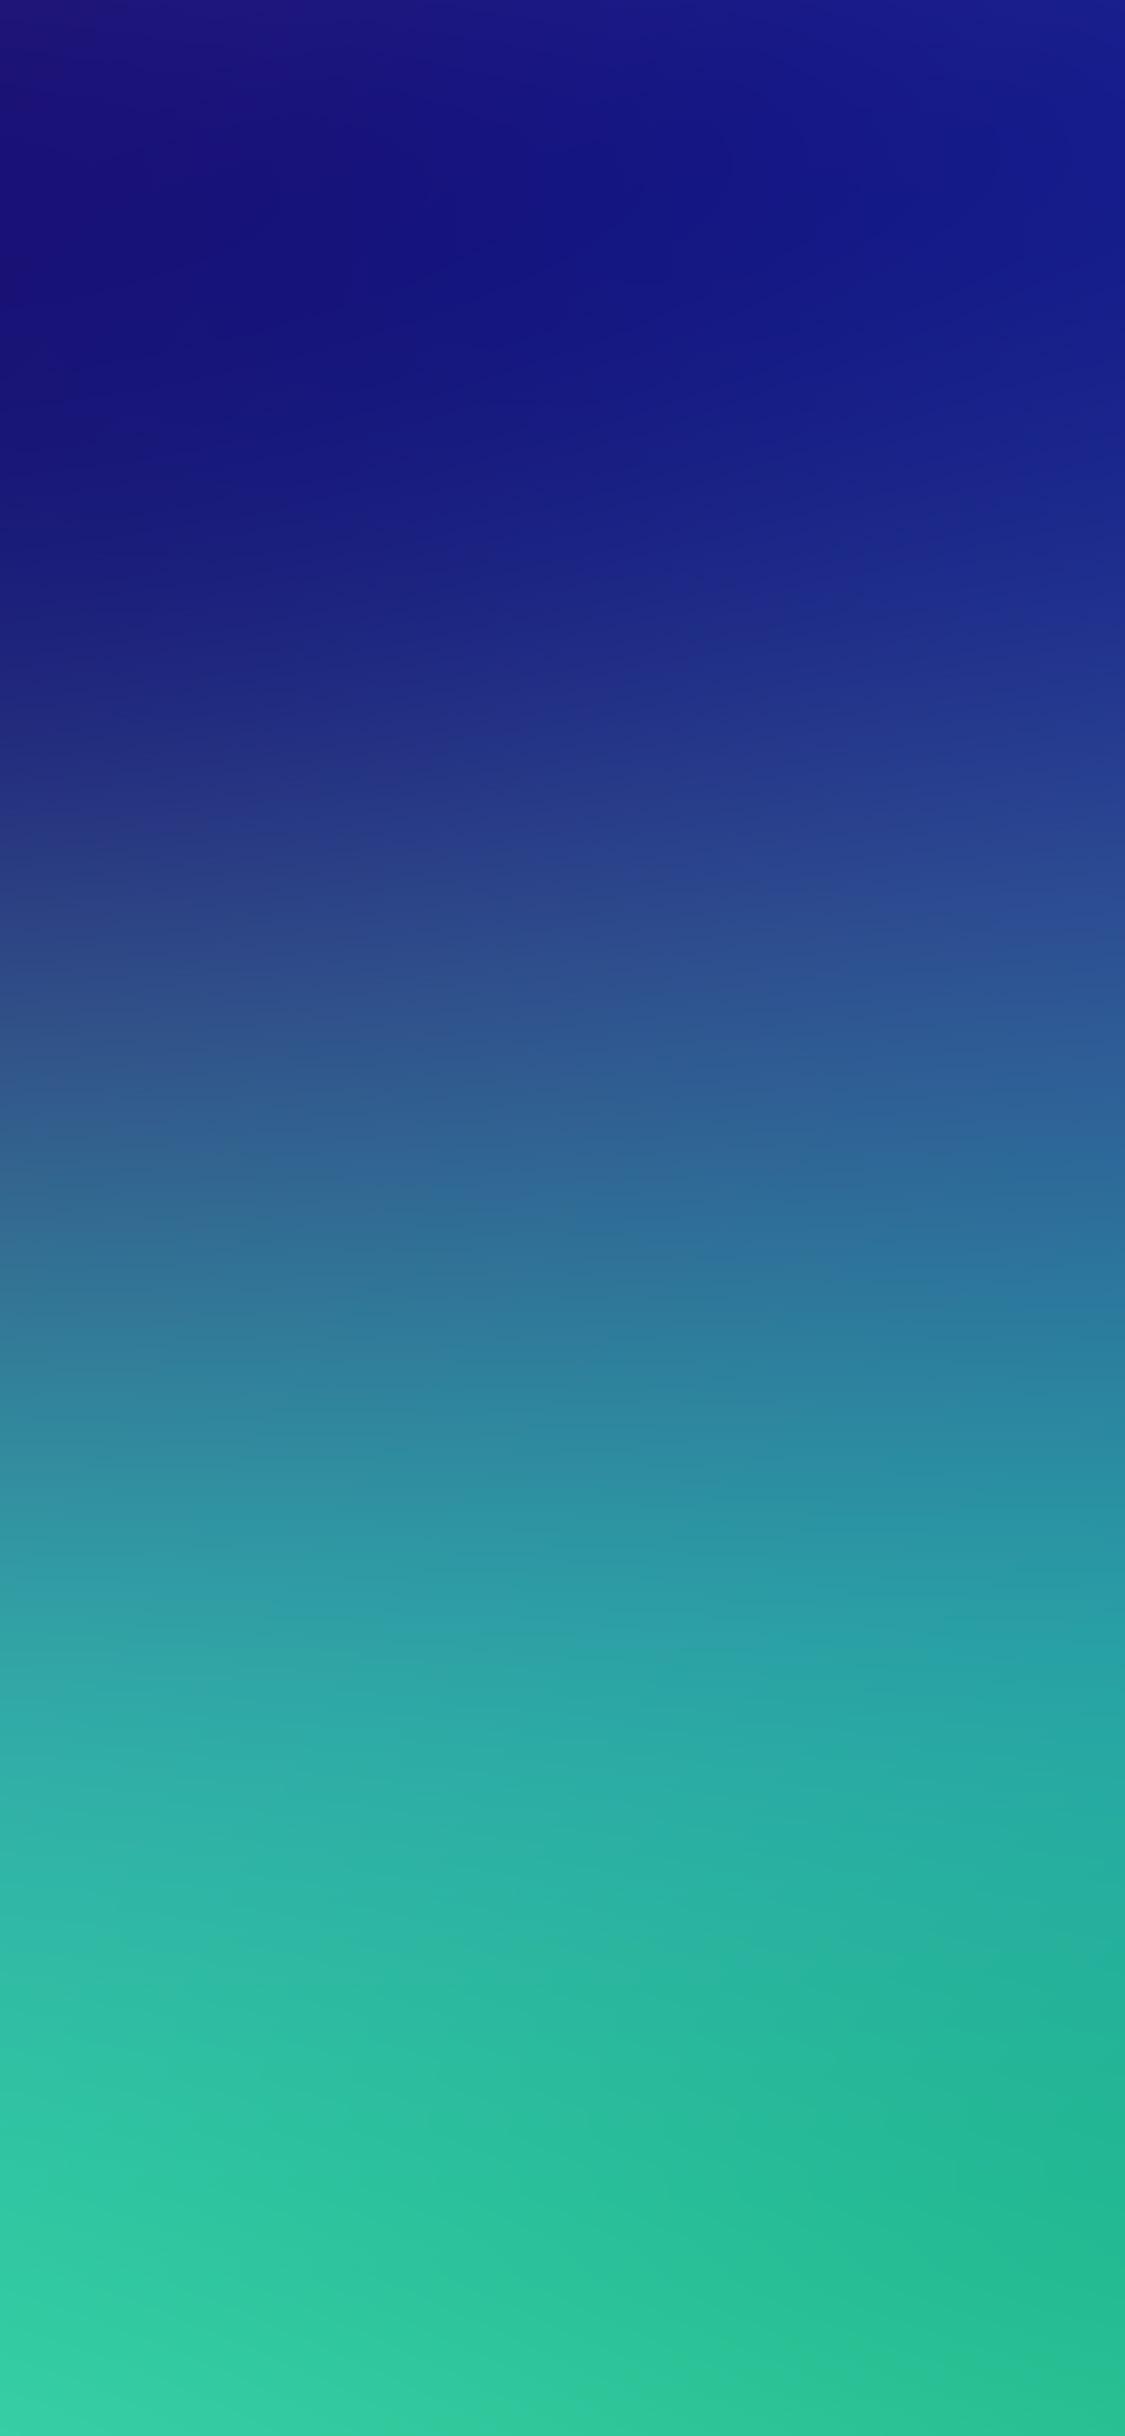 iPhonexpapers.com-Apple-iPhone-wallpaper-sn17-blue-green-blur-gradation